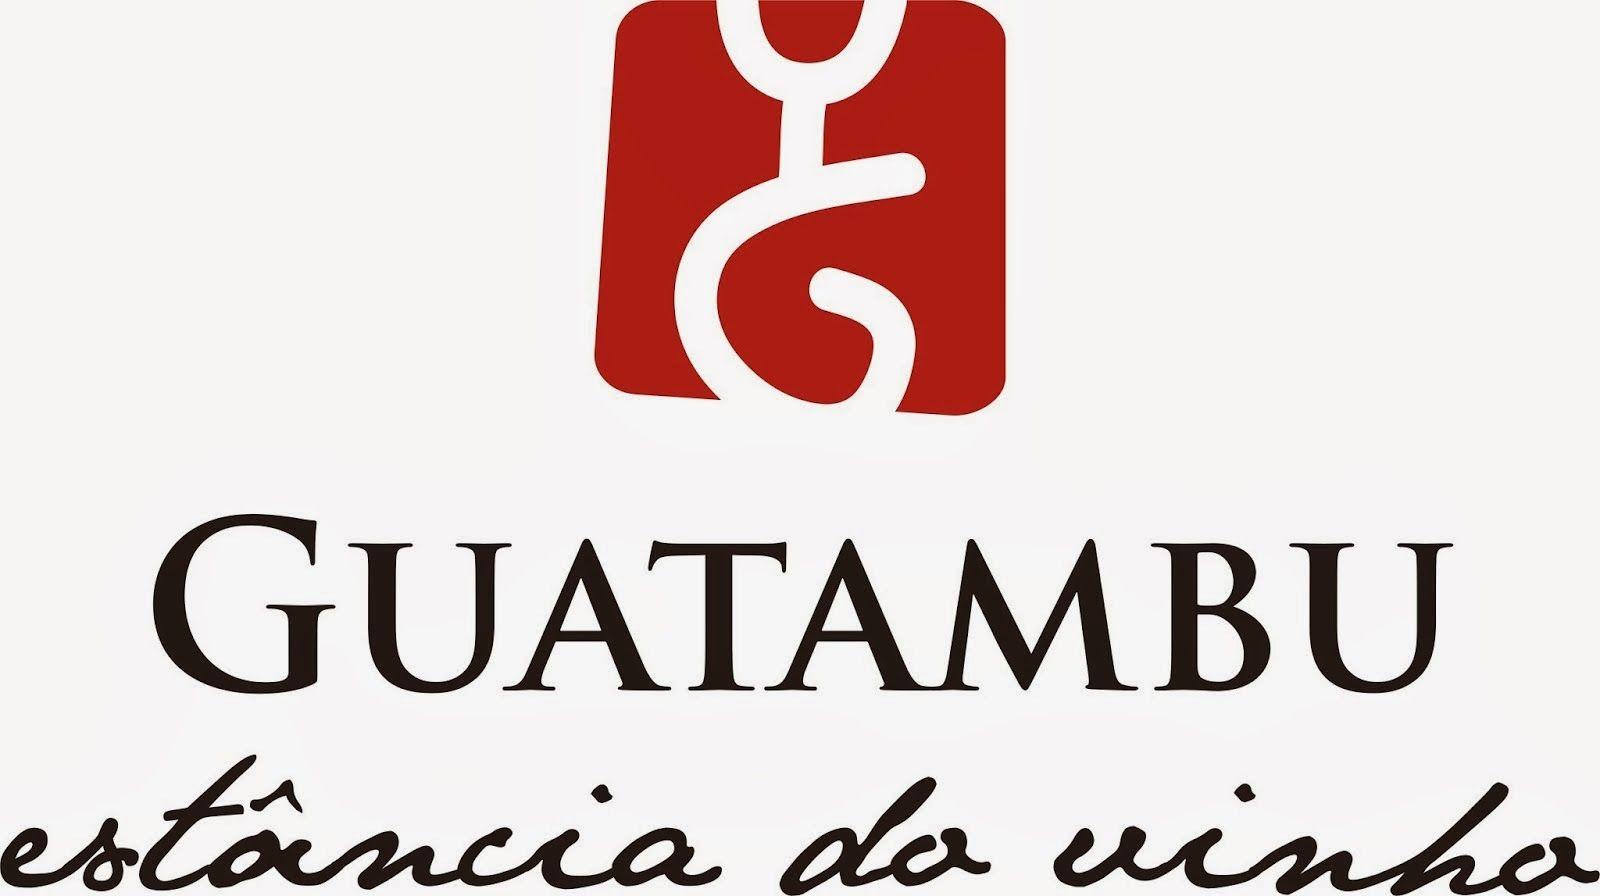 Guatambu